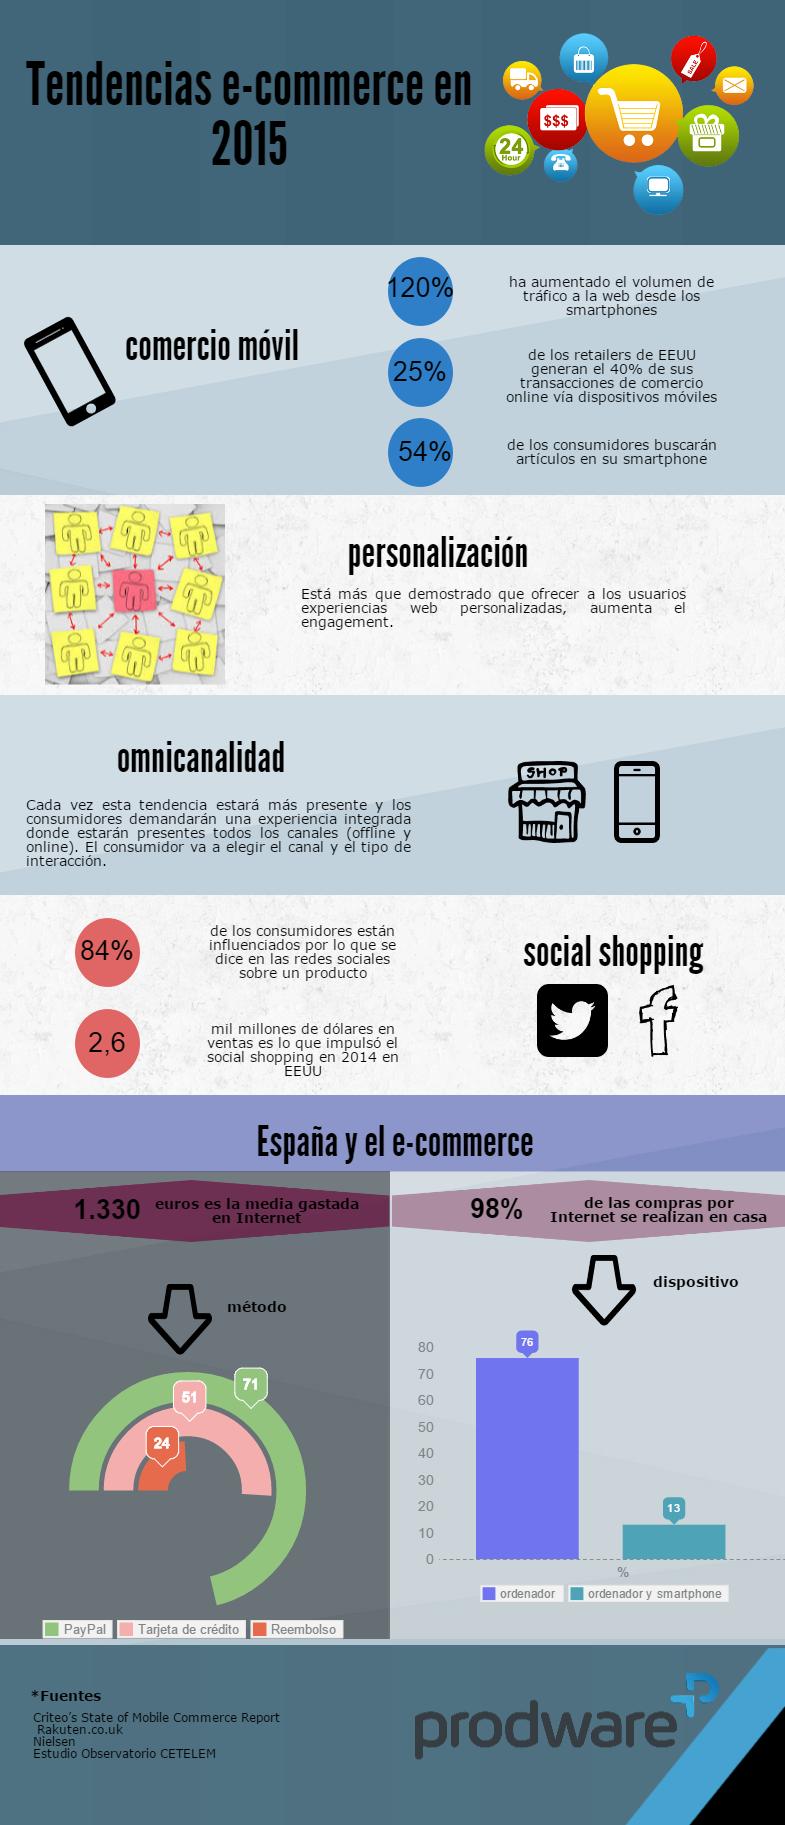 ecommerce2015 (4)